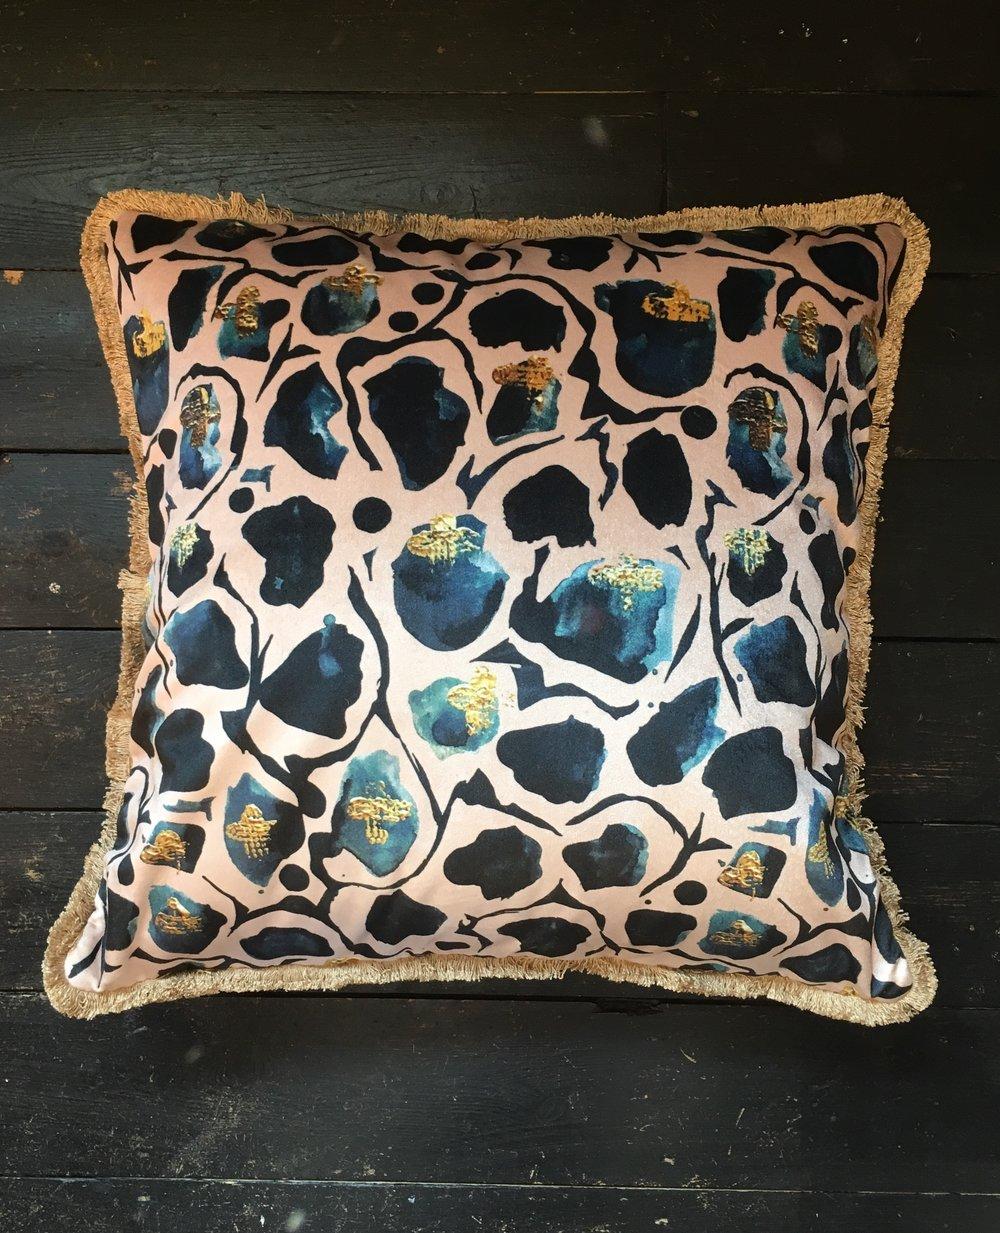 Image Credit Anna Hayman Designs - Beautifully crafted cushion in a Giraffe fabric